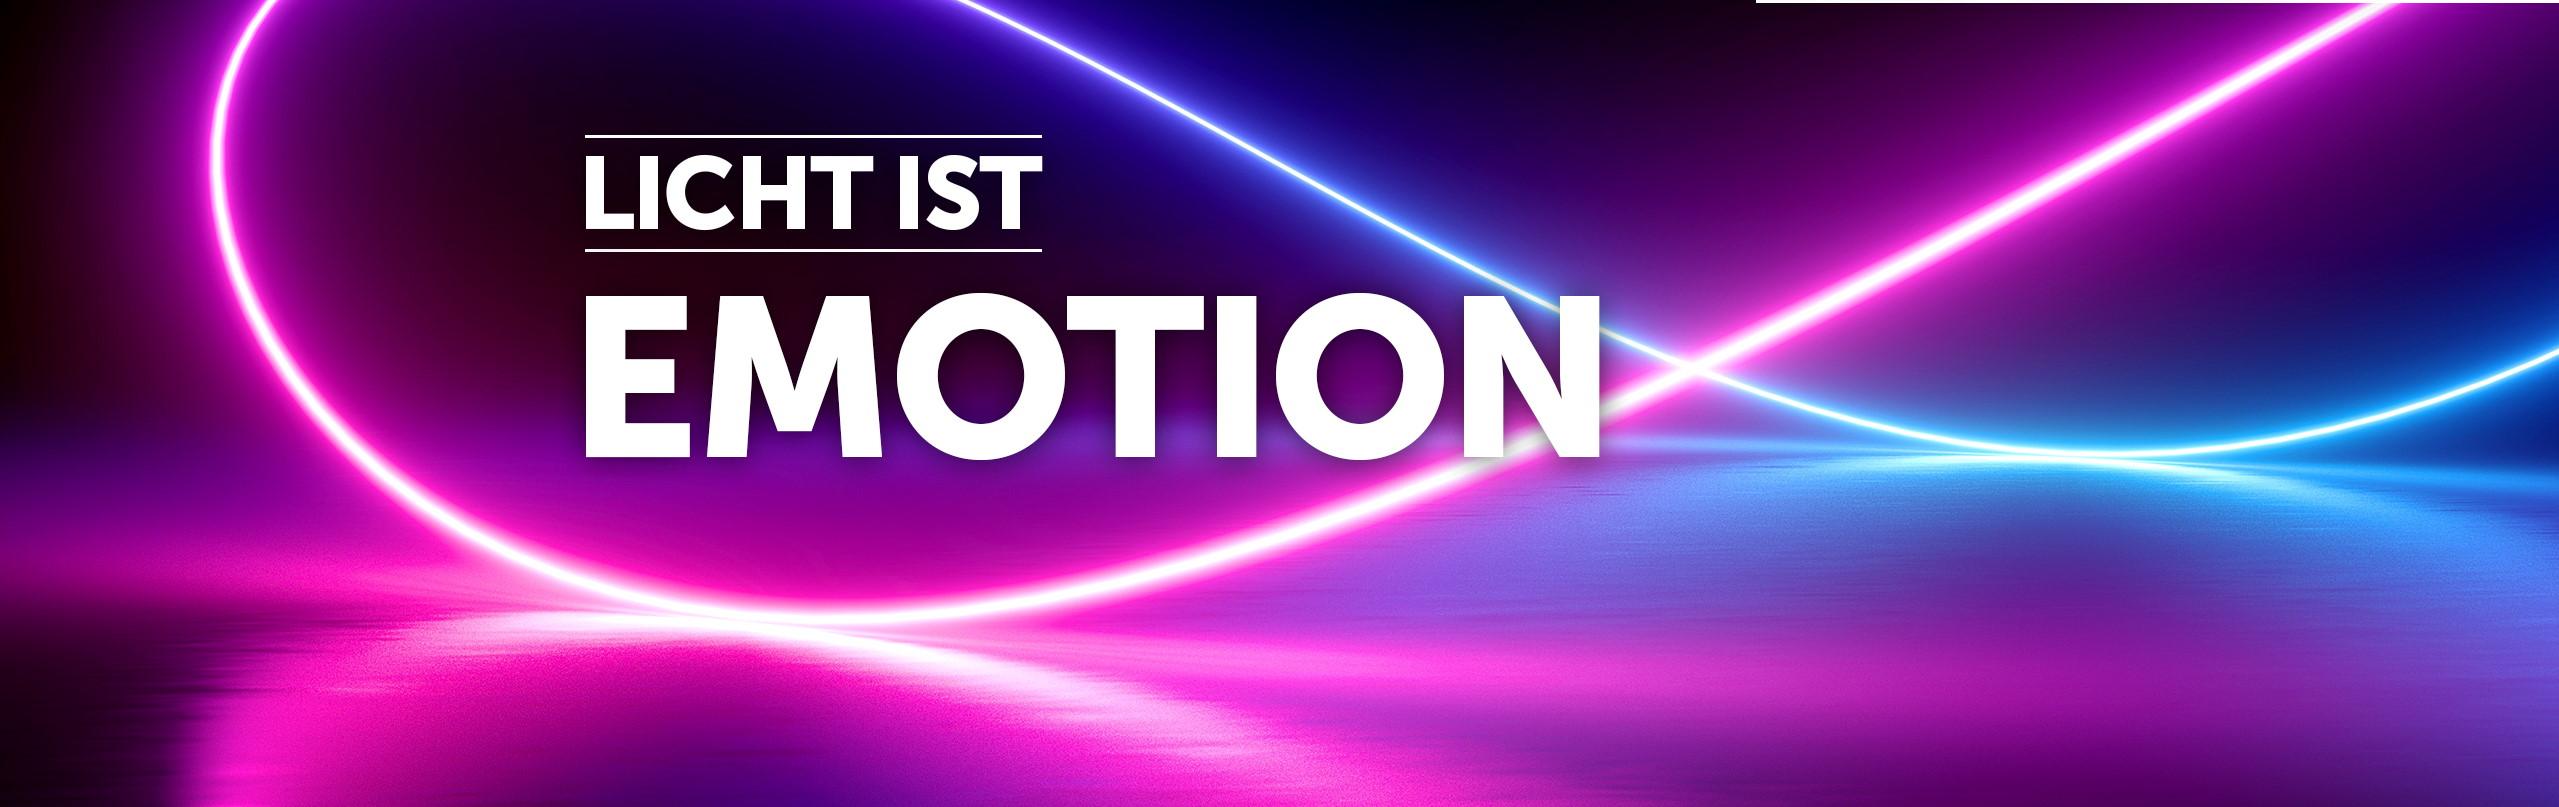 Neon-Nagel_Titelbild_Emotion